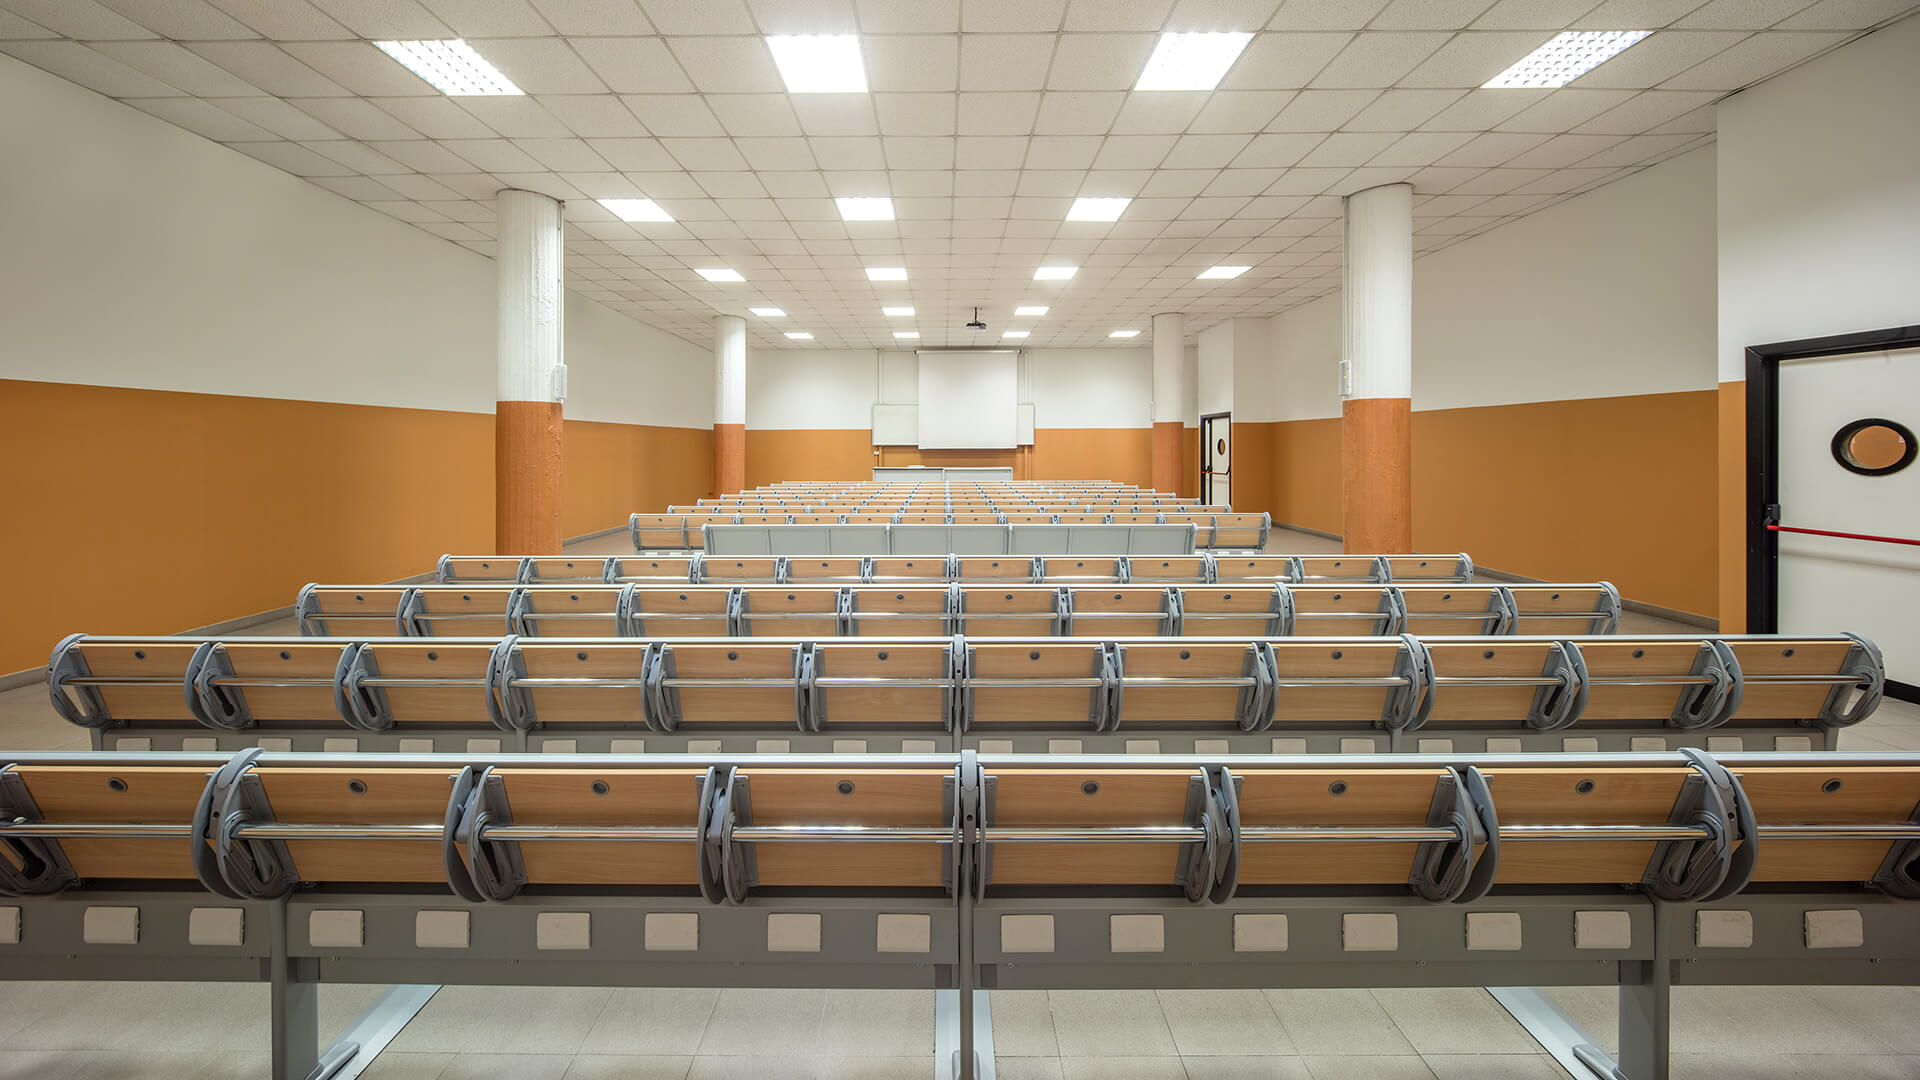 univertsita-studi-di-genova-q3000-study-bench-by-lamm-11